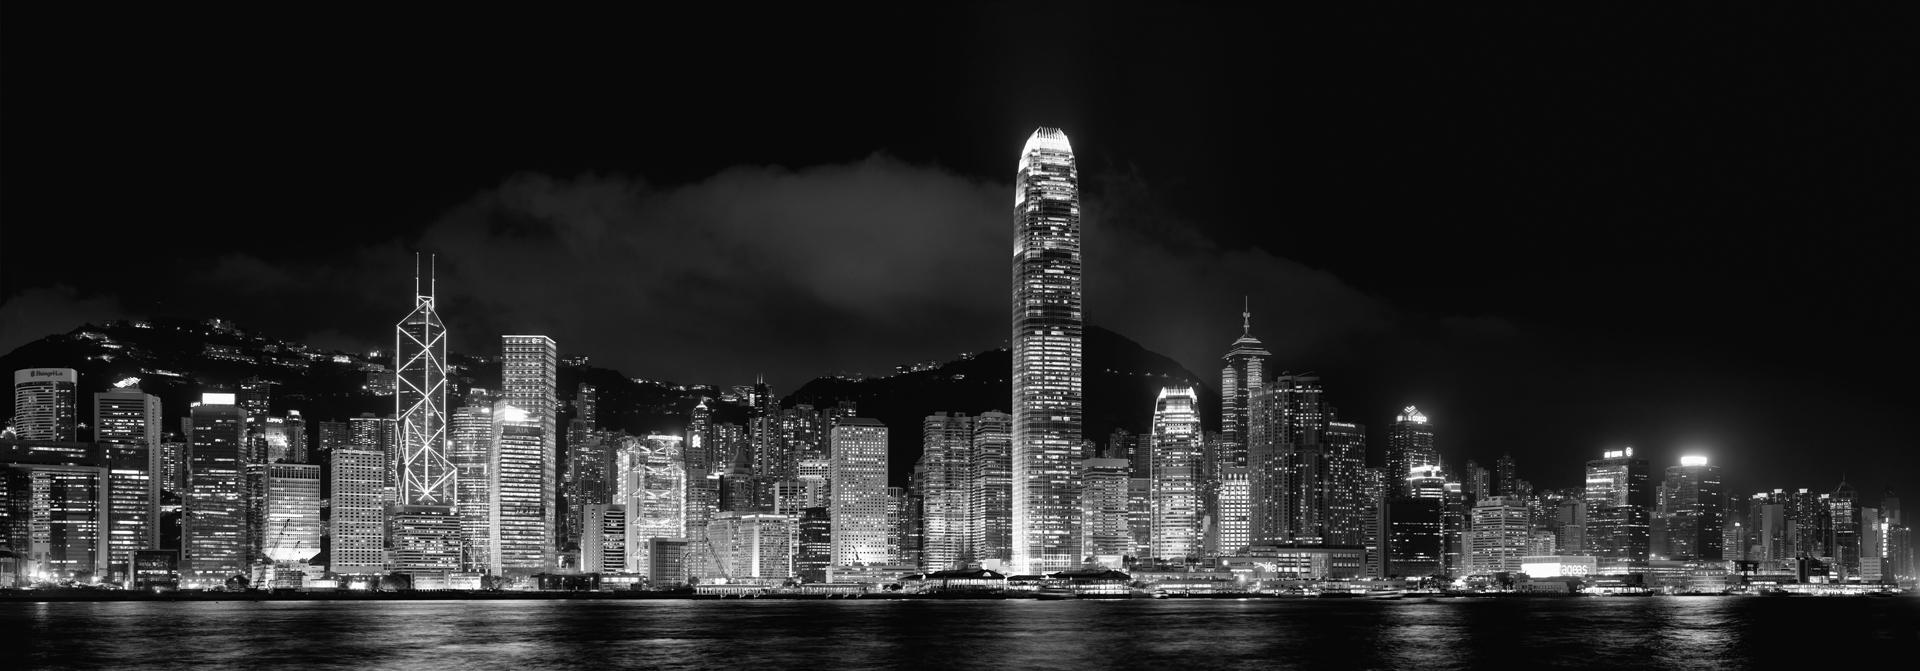 Hongkong Skylines Panoramic black and white